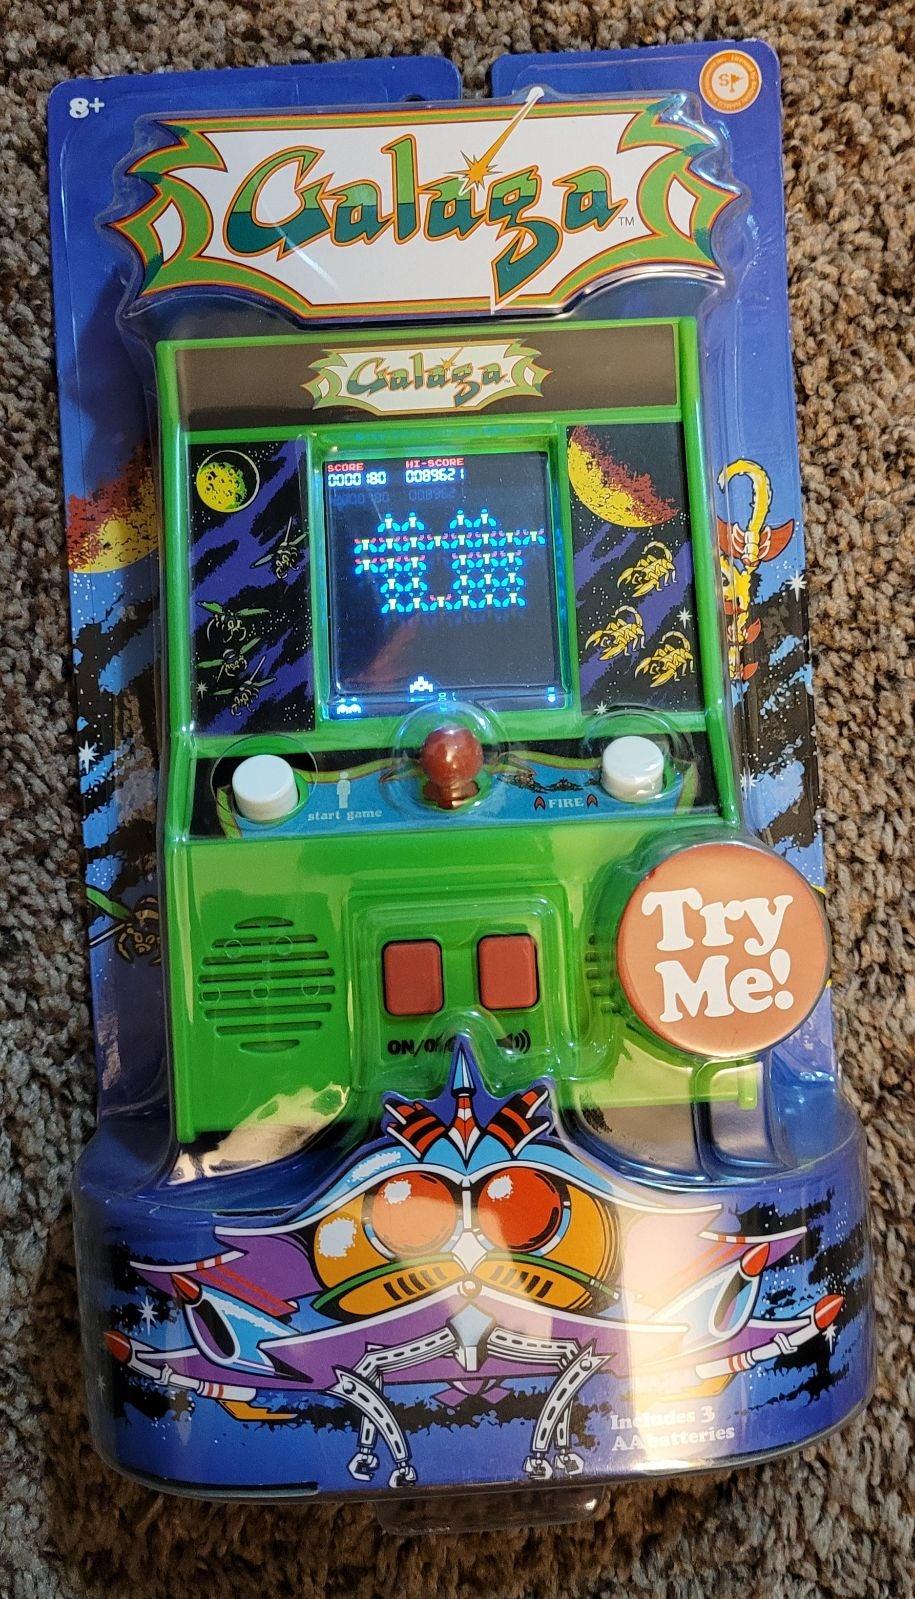 Galaga mini arcade